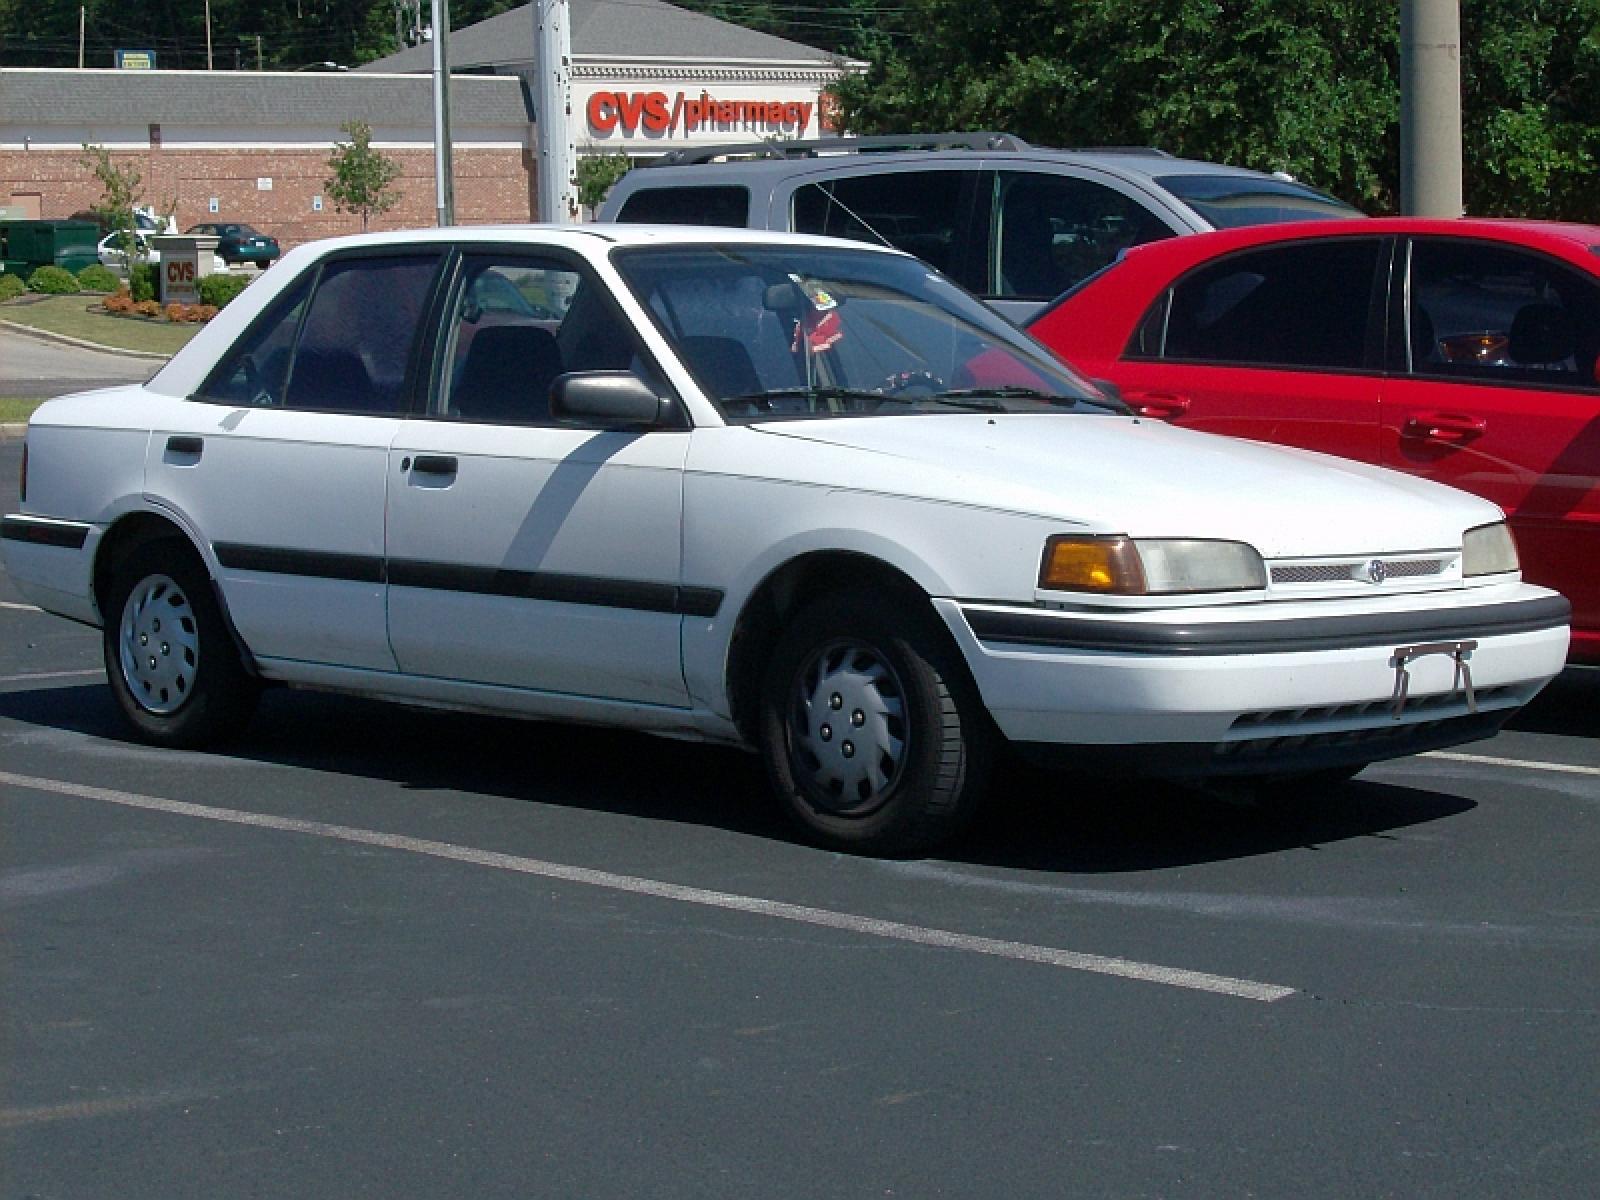 1993 mazda protege 1600px image 9 neo drive